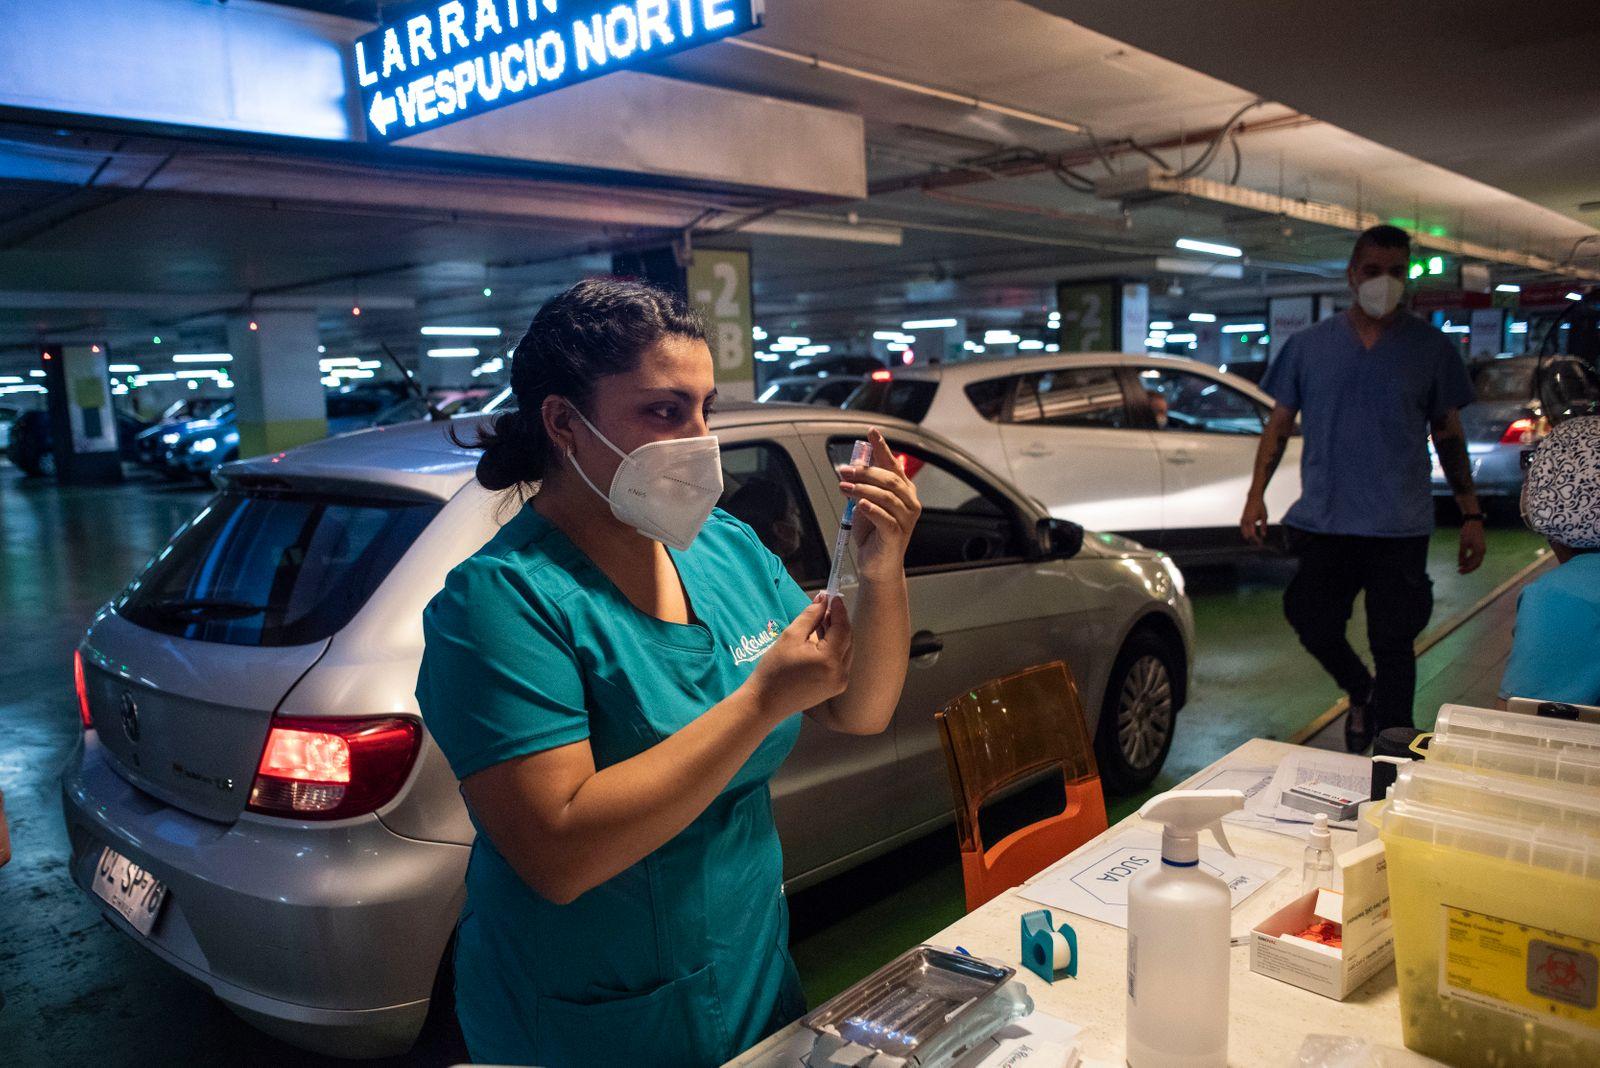 Chile Leads Coronavirus Vaccination Race in Latin America